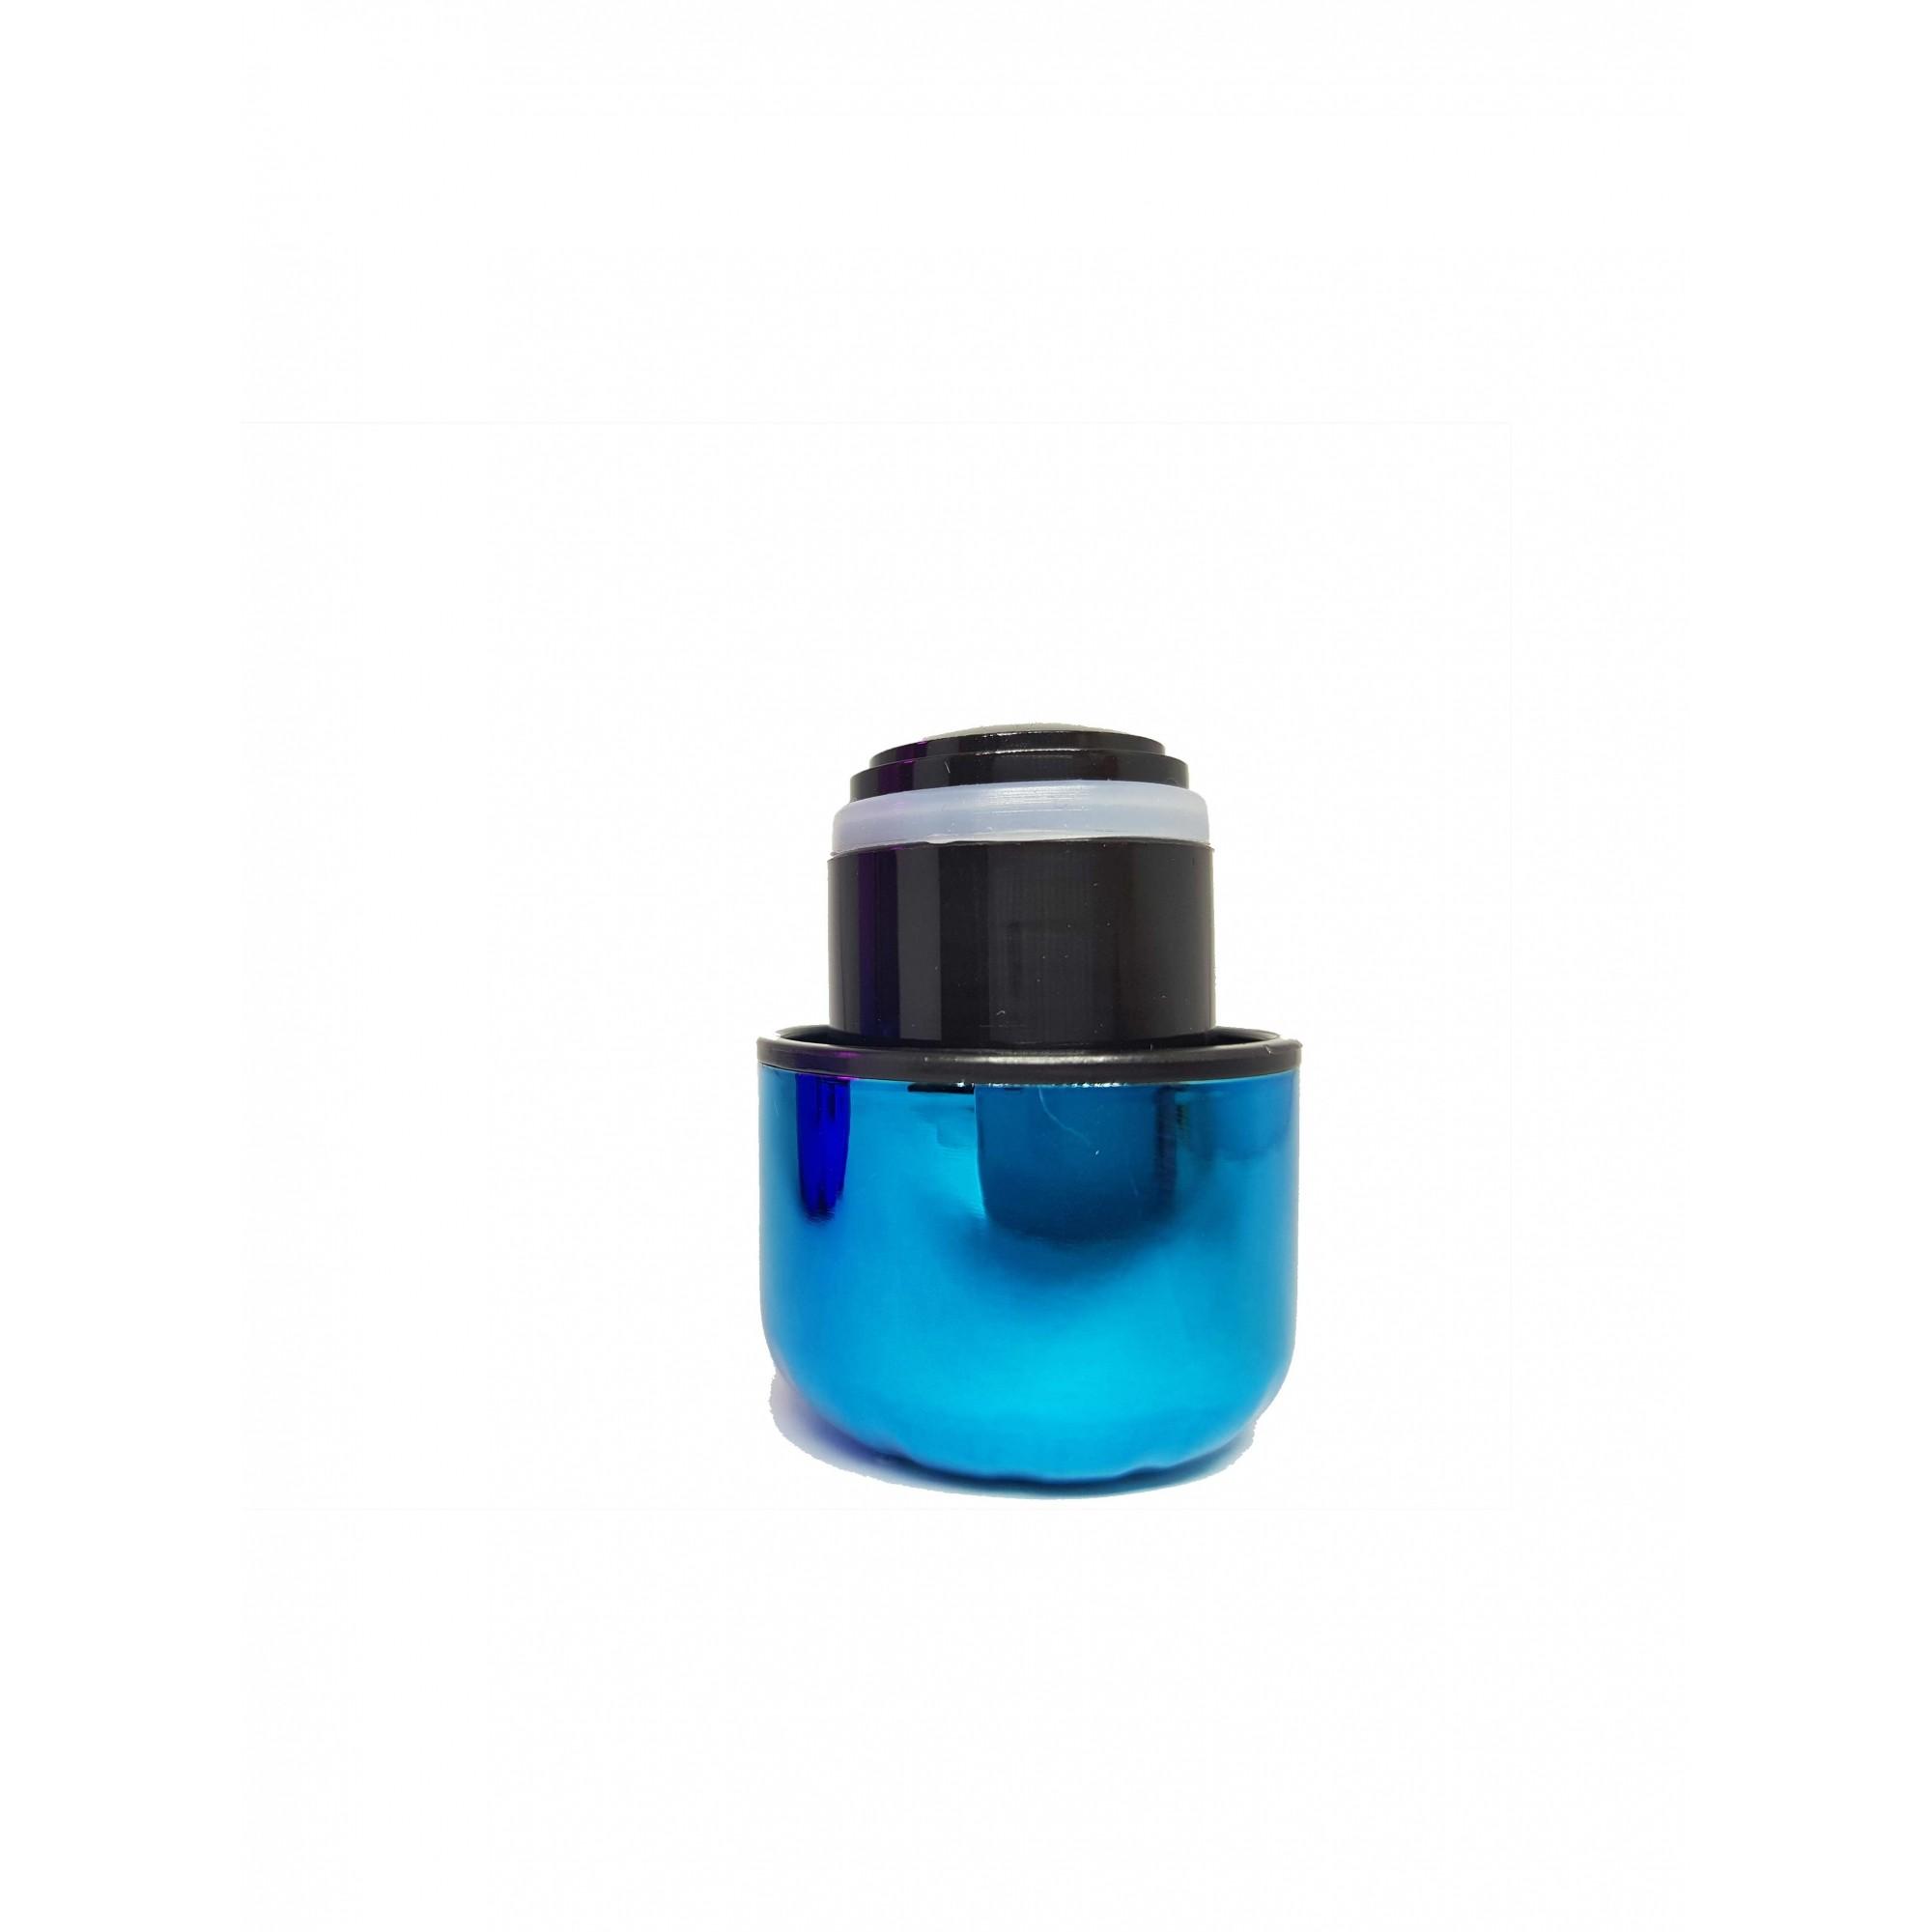 Kit Mundo Bolsa papel + garrafa Holográfica + kit 5 em 1 inox Dourado